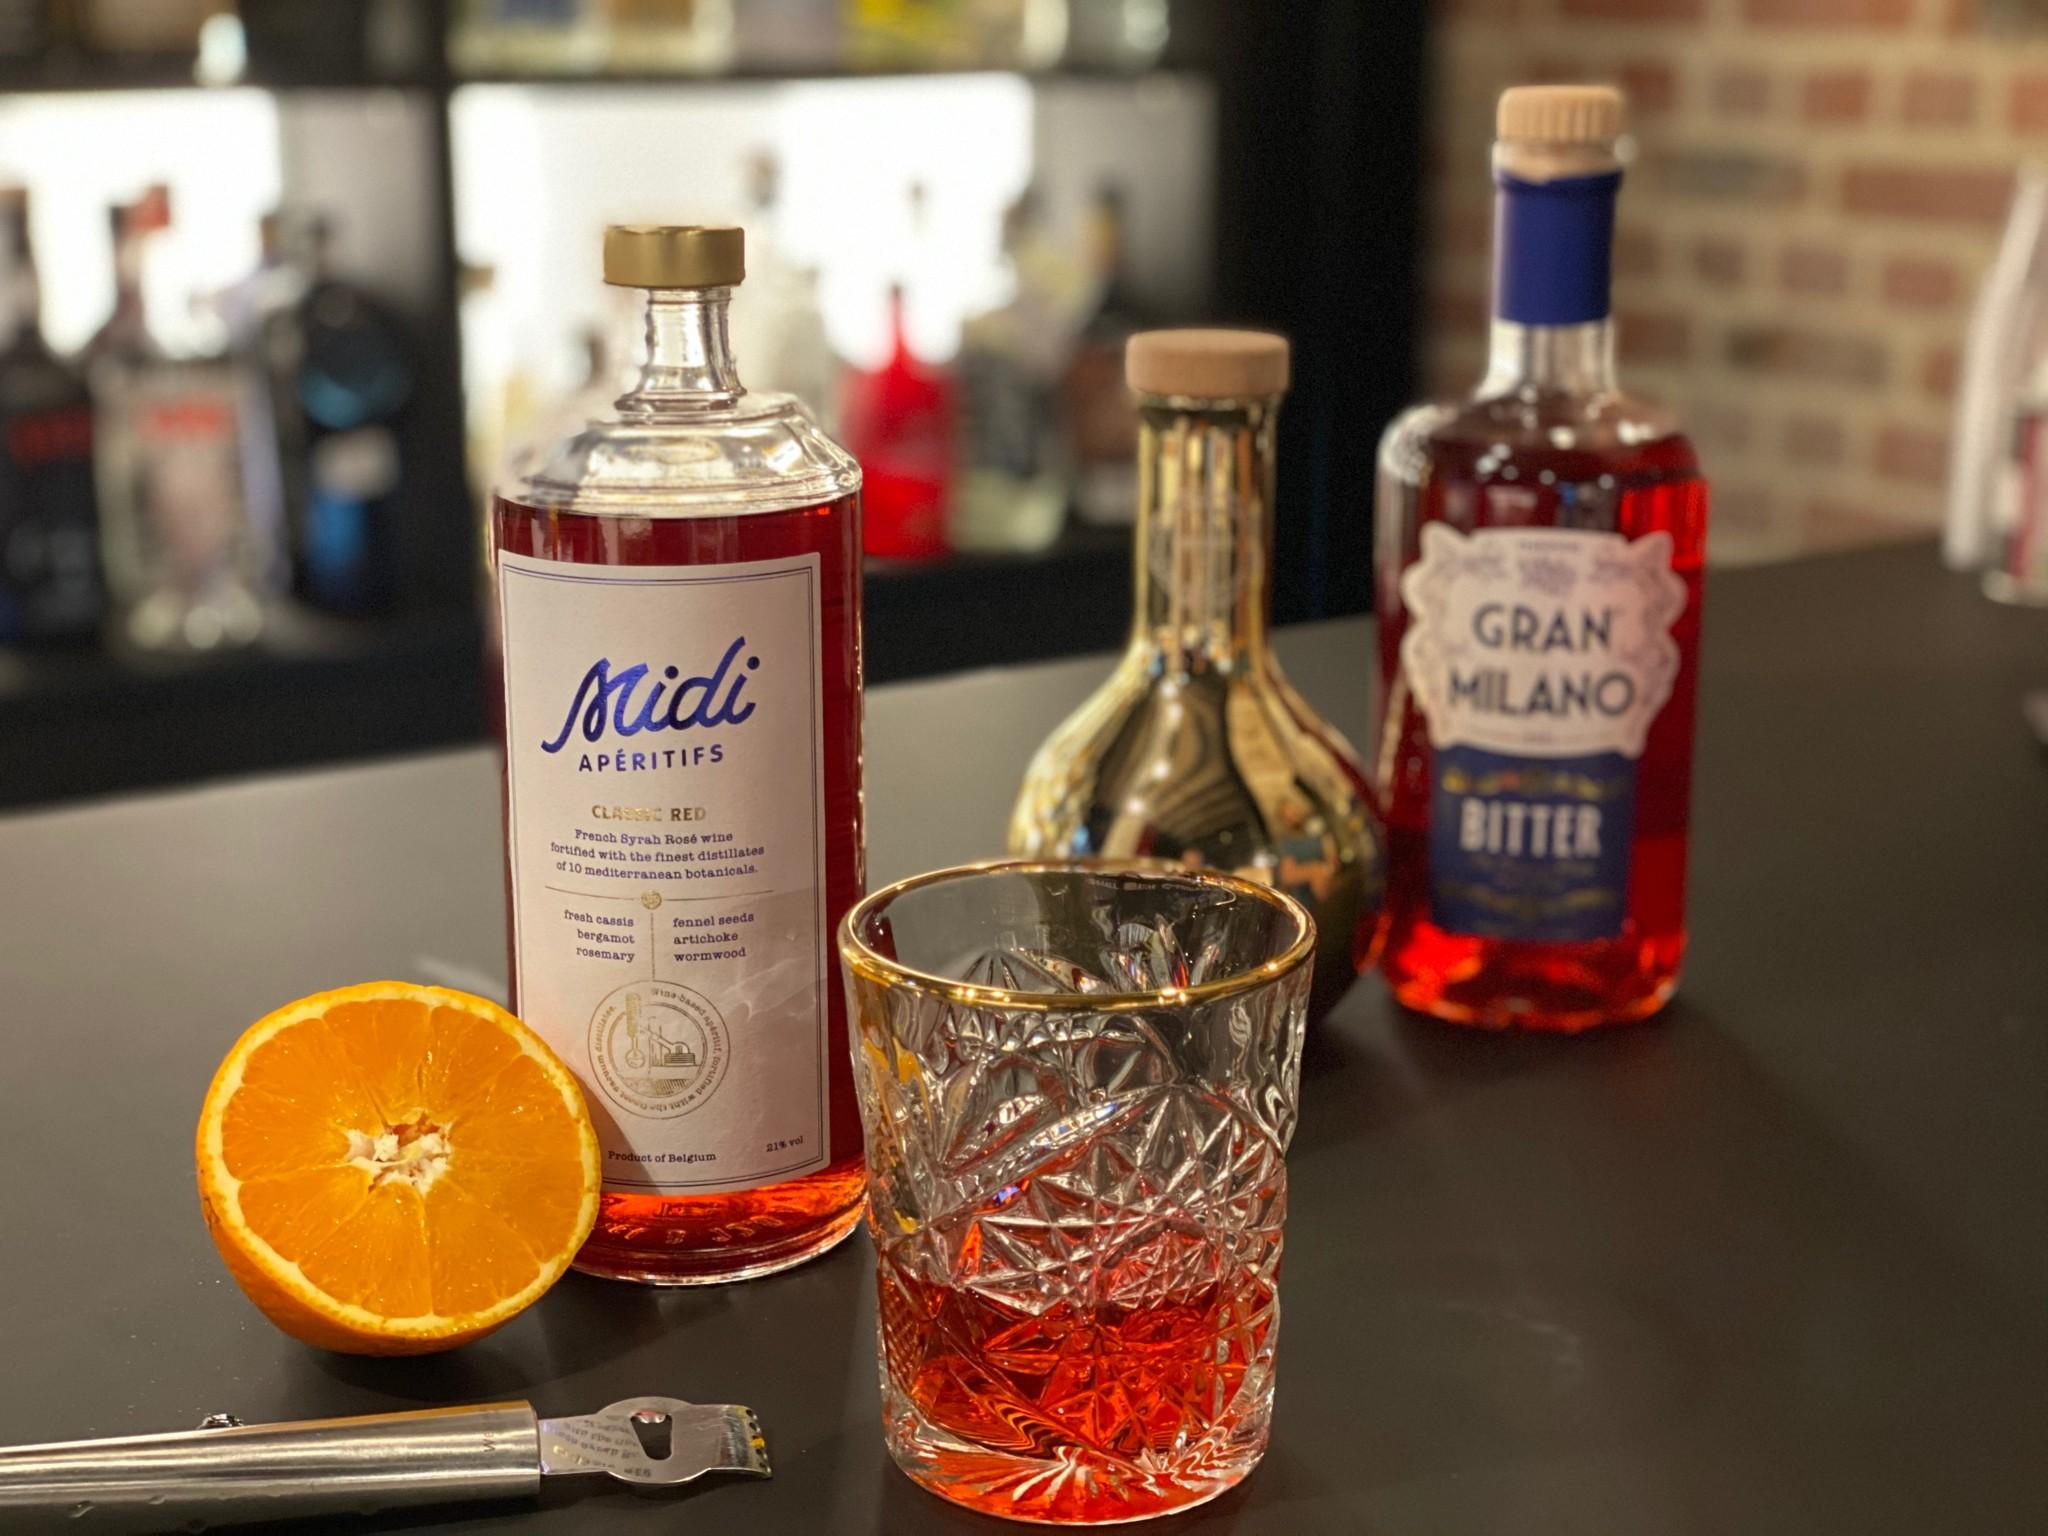 Negroni cocktail Midi aperitifs classic red